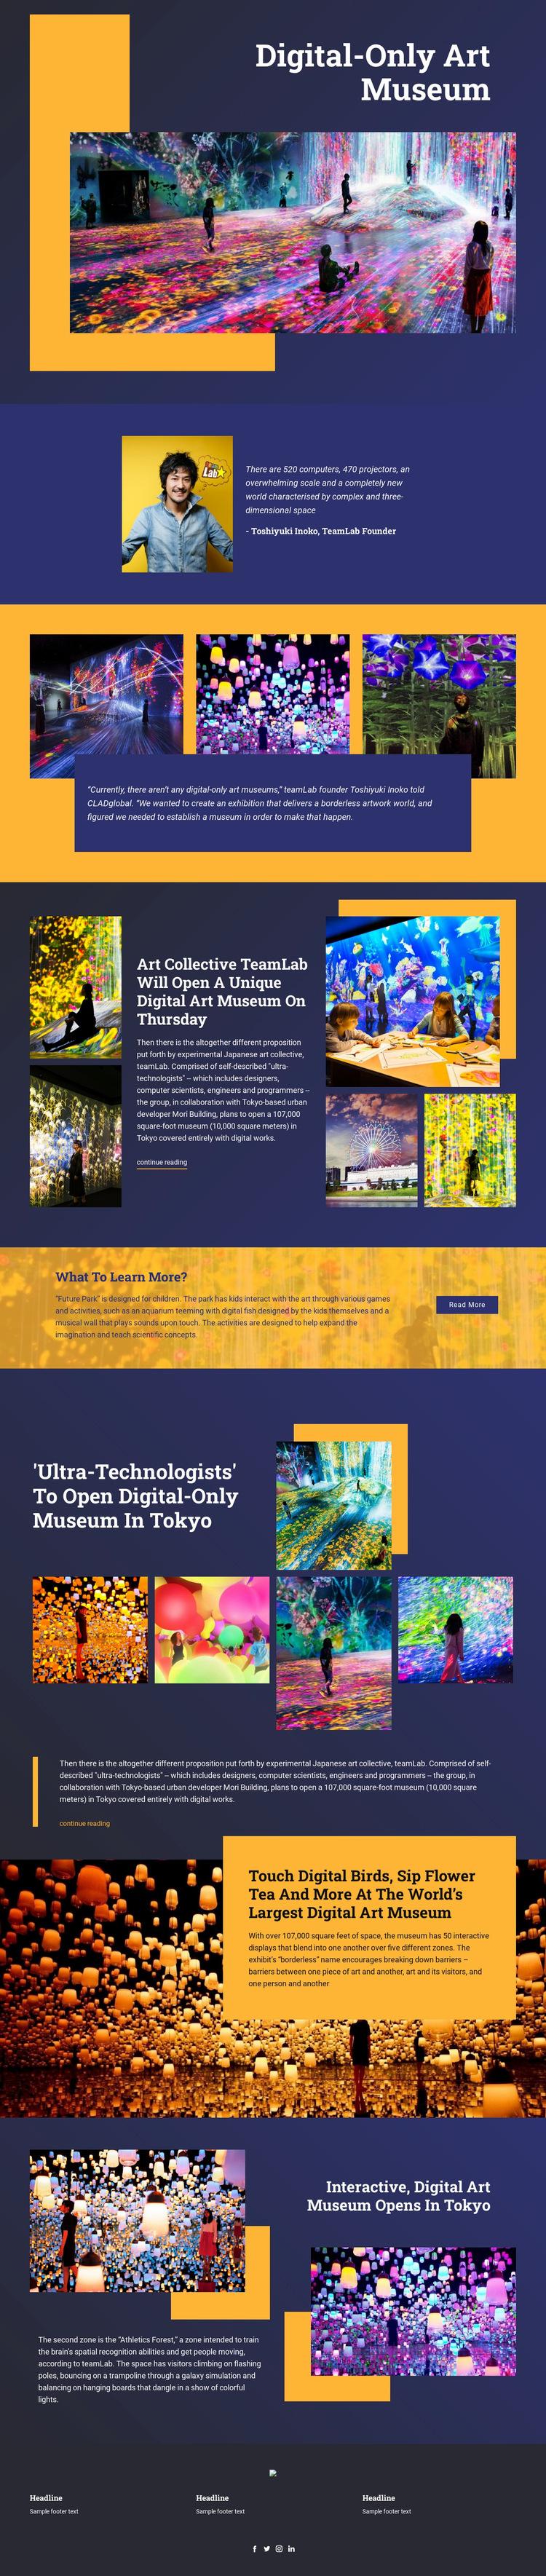 Digital Art Museum Website Builder